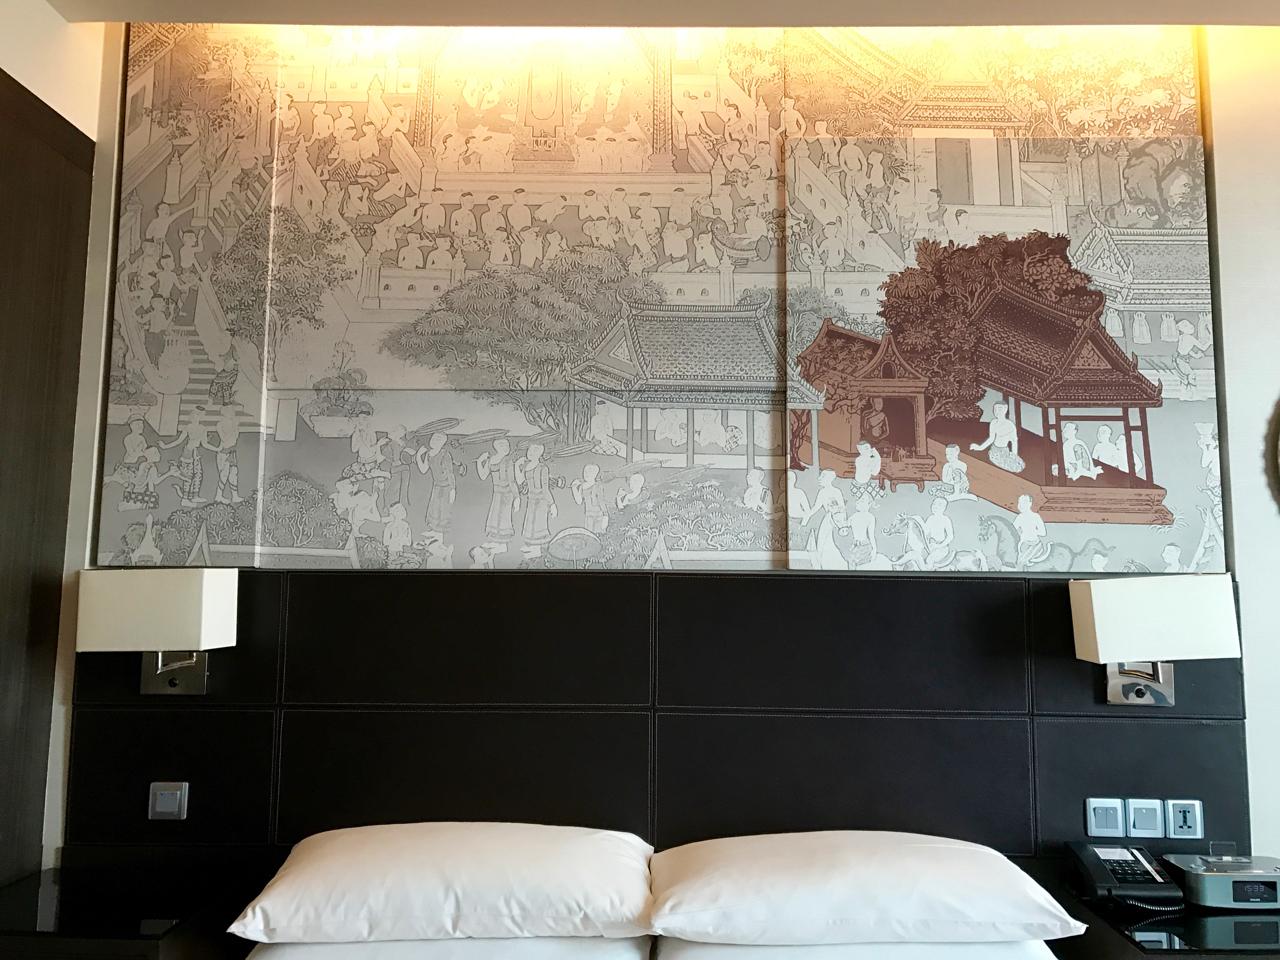 Bangkok Marriott Sukhumvit Hotel review, the room